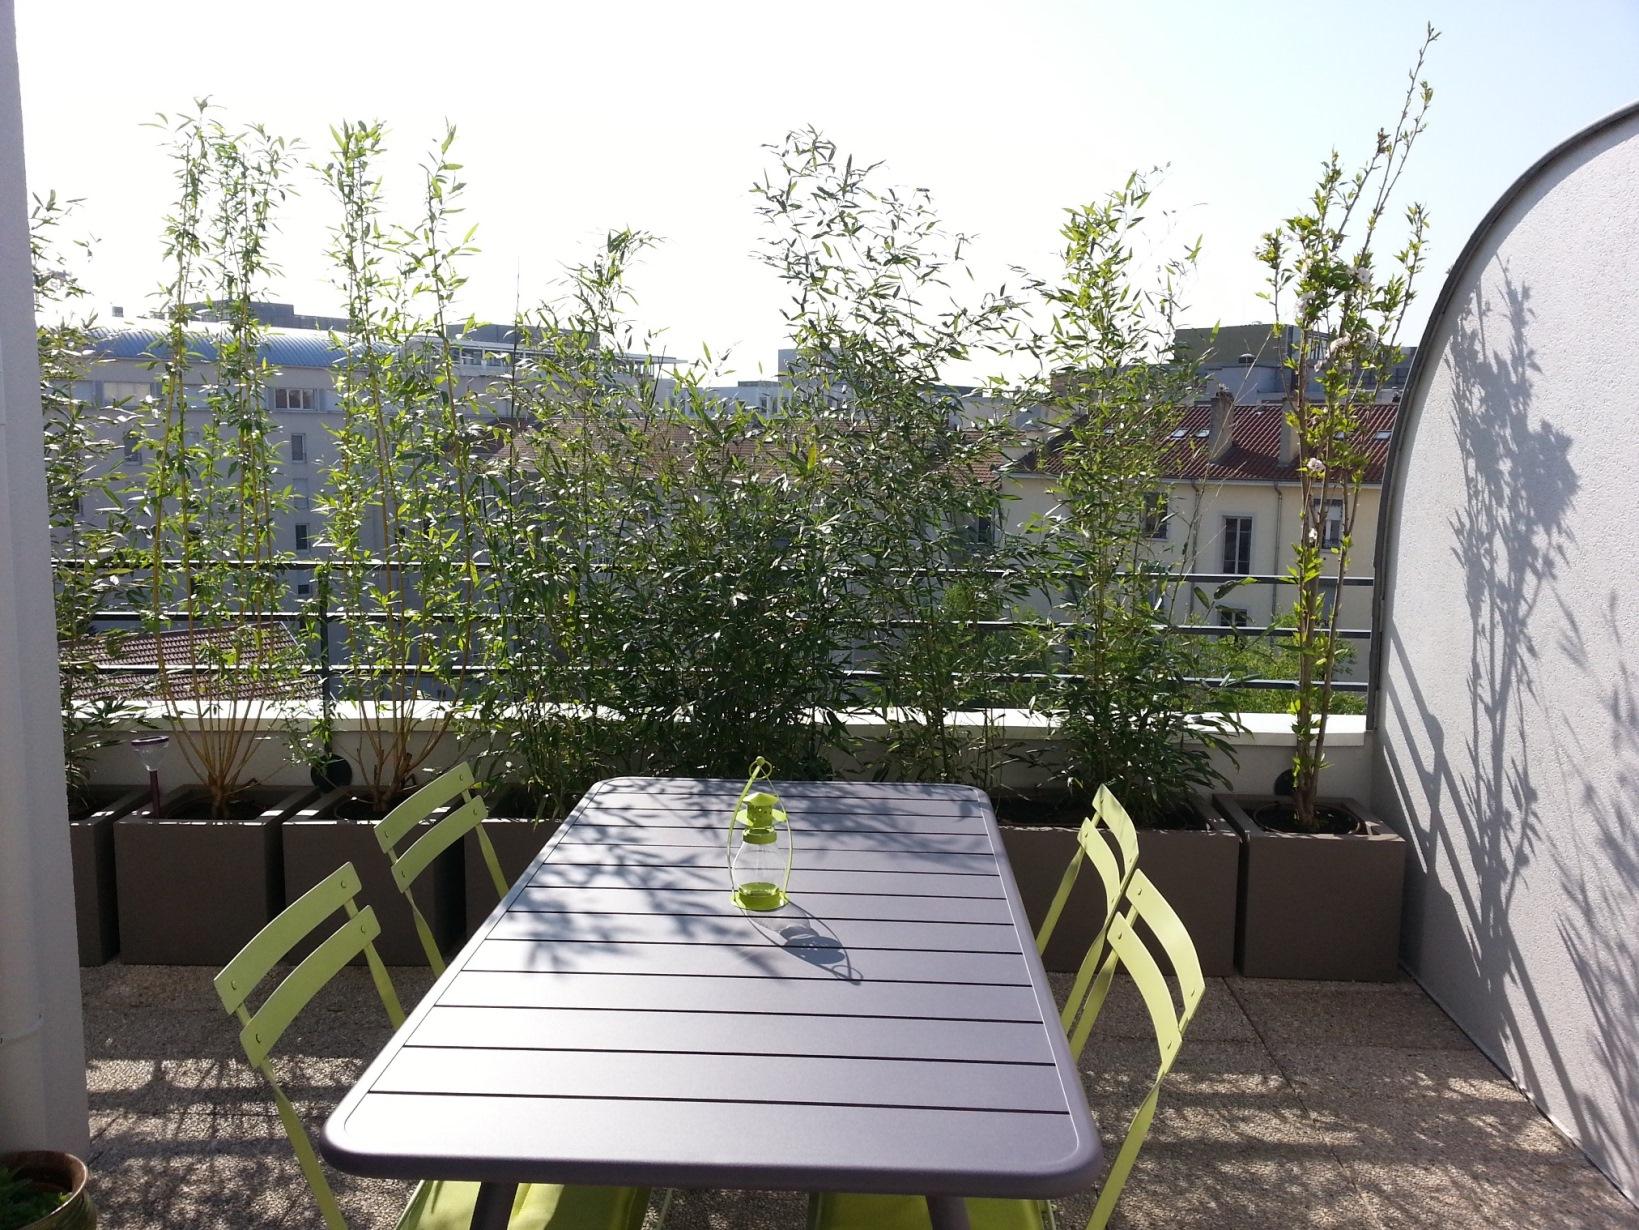 Jour de jardin paysagiste lyon balcons - Paysagiste lyon ...